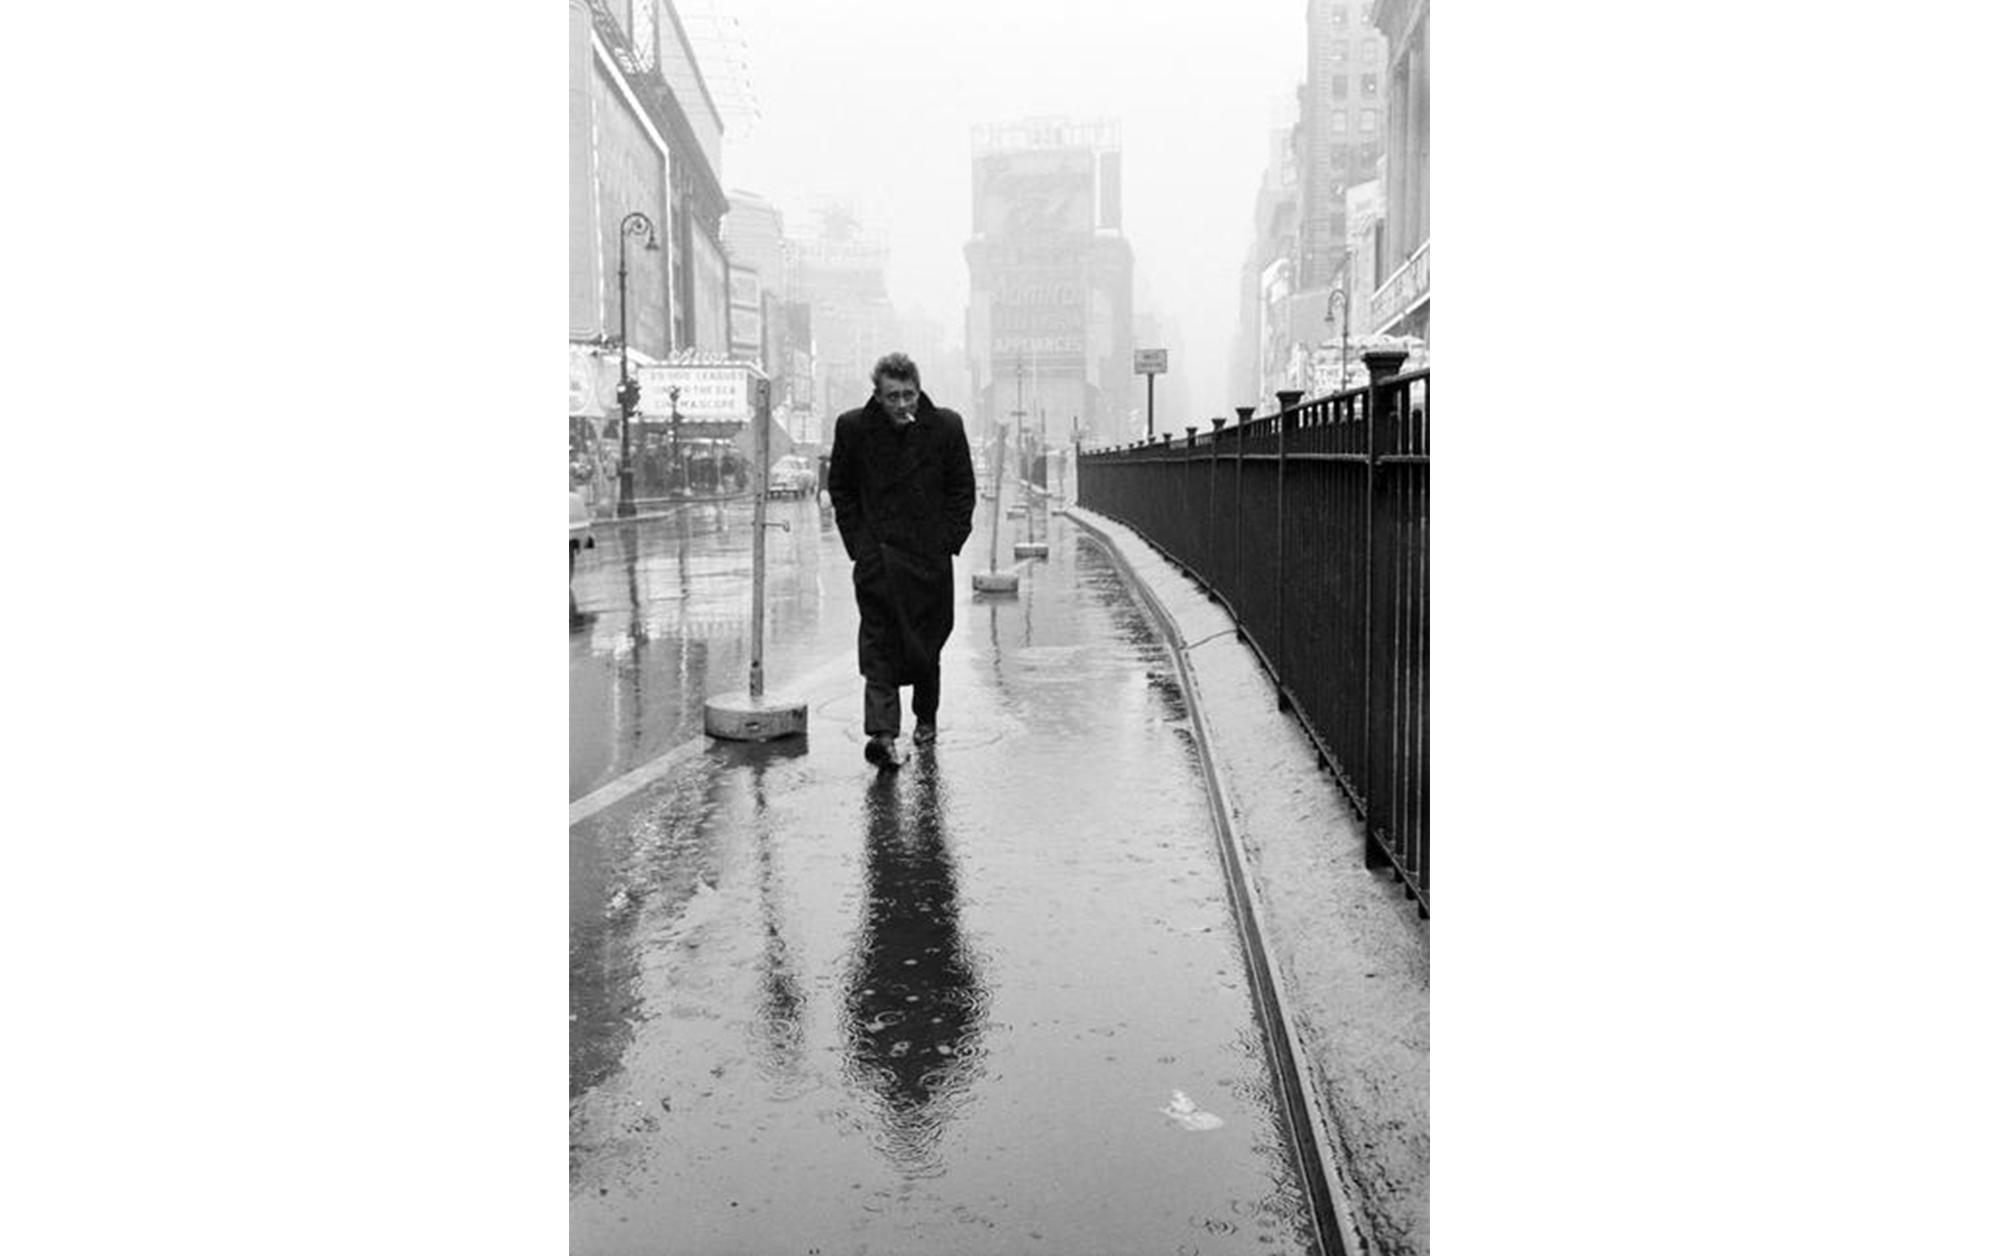 © Dennis Stock/Magnum Photos